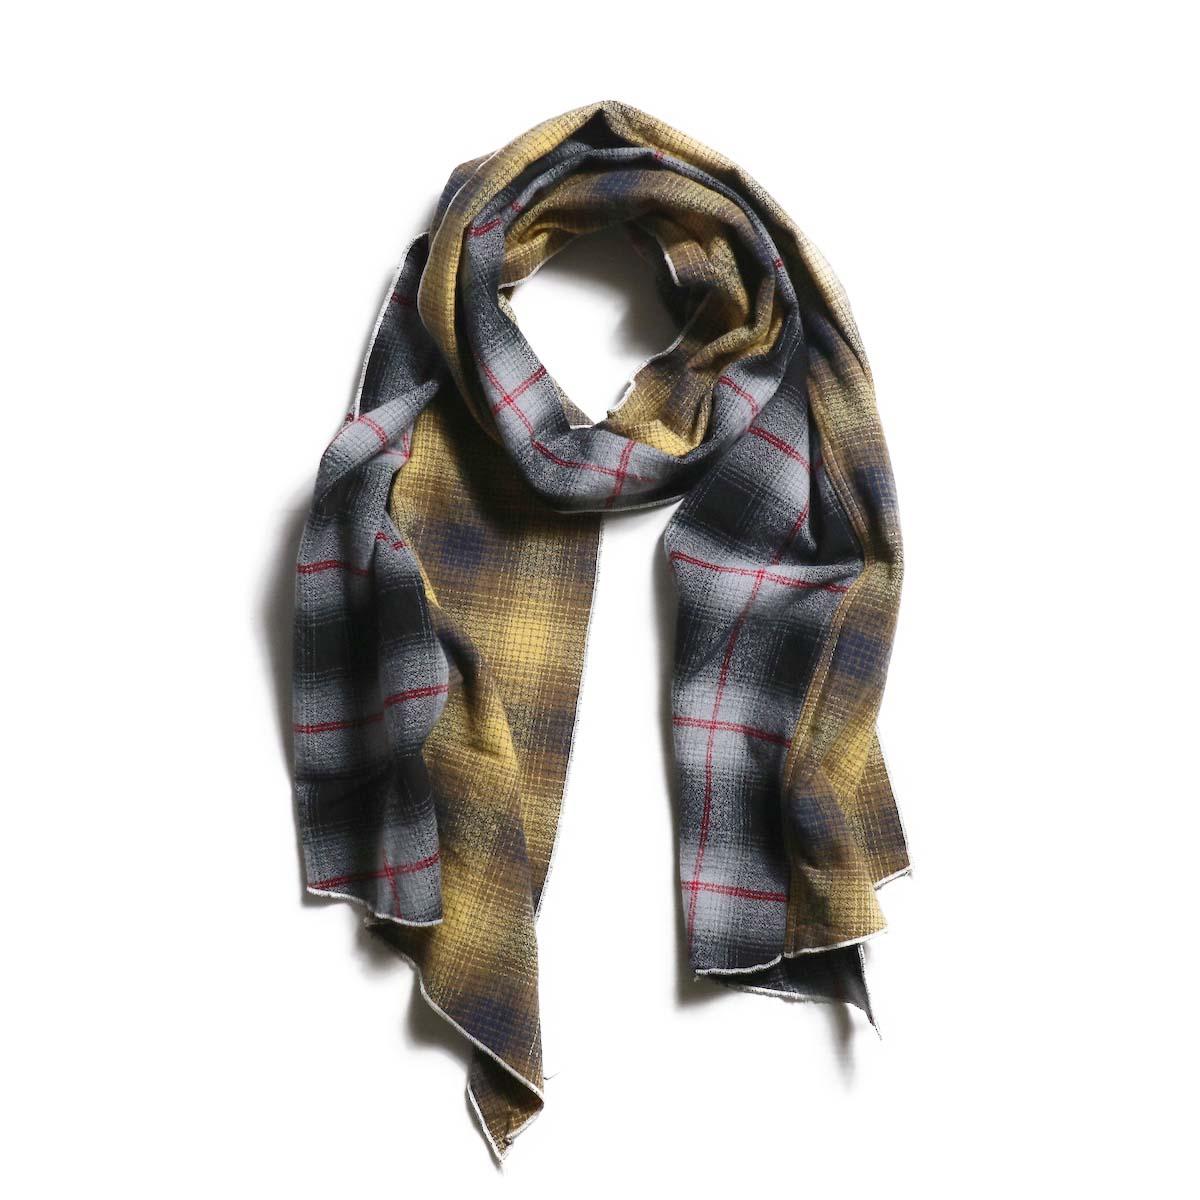 AiE / dls scarf - Cotton Flannel Plaid (Yellow)